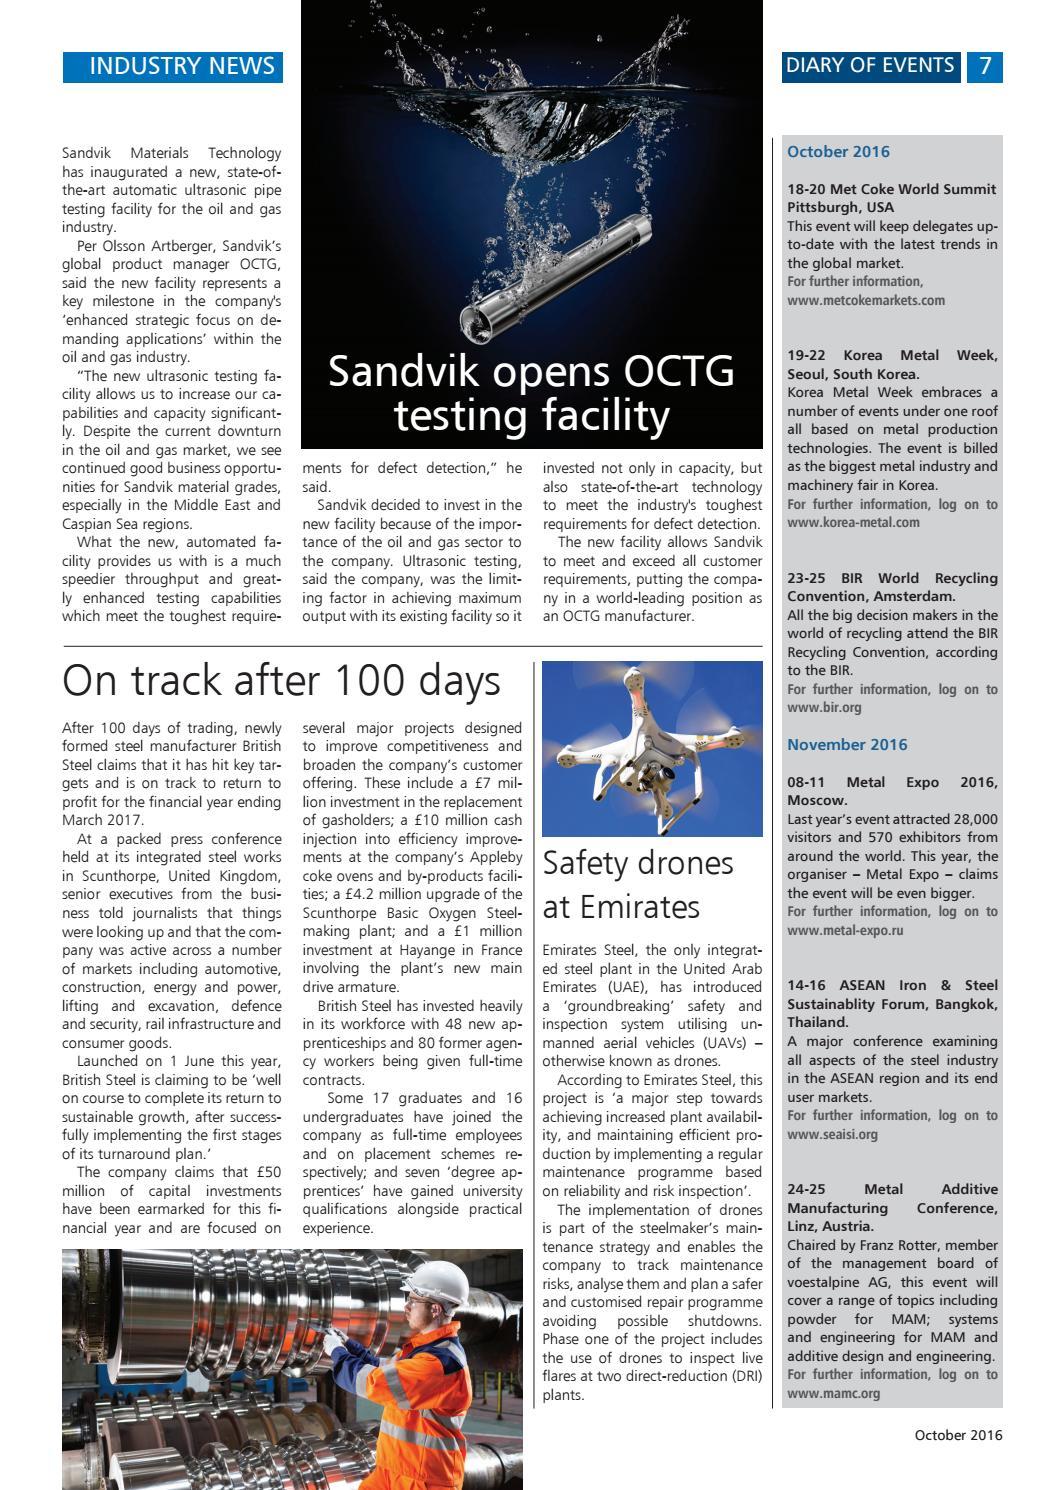 Steel Times International October 2016 by Quartz - issuu